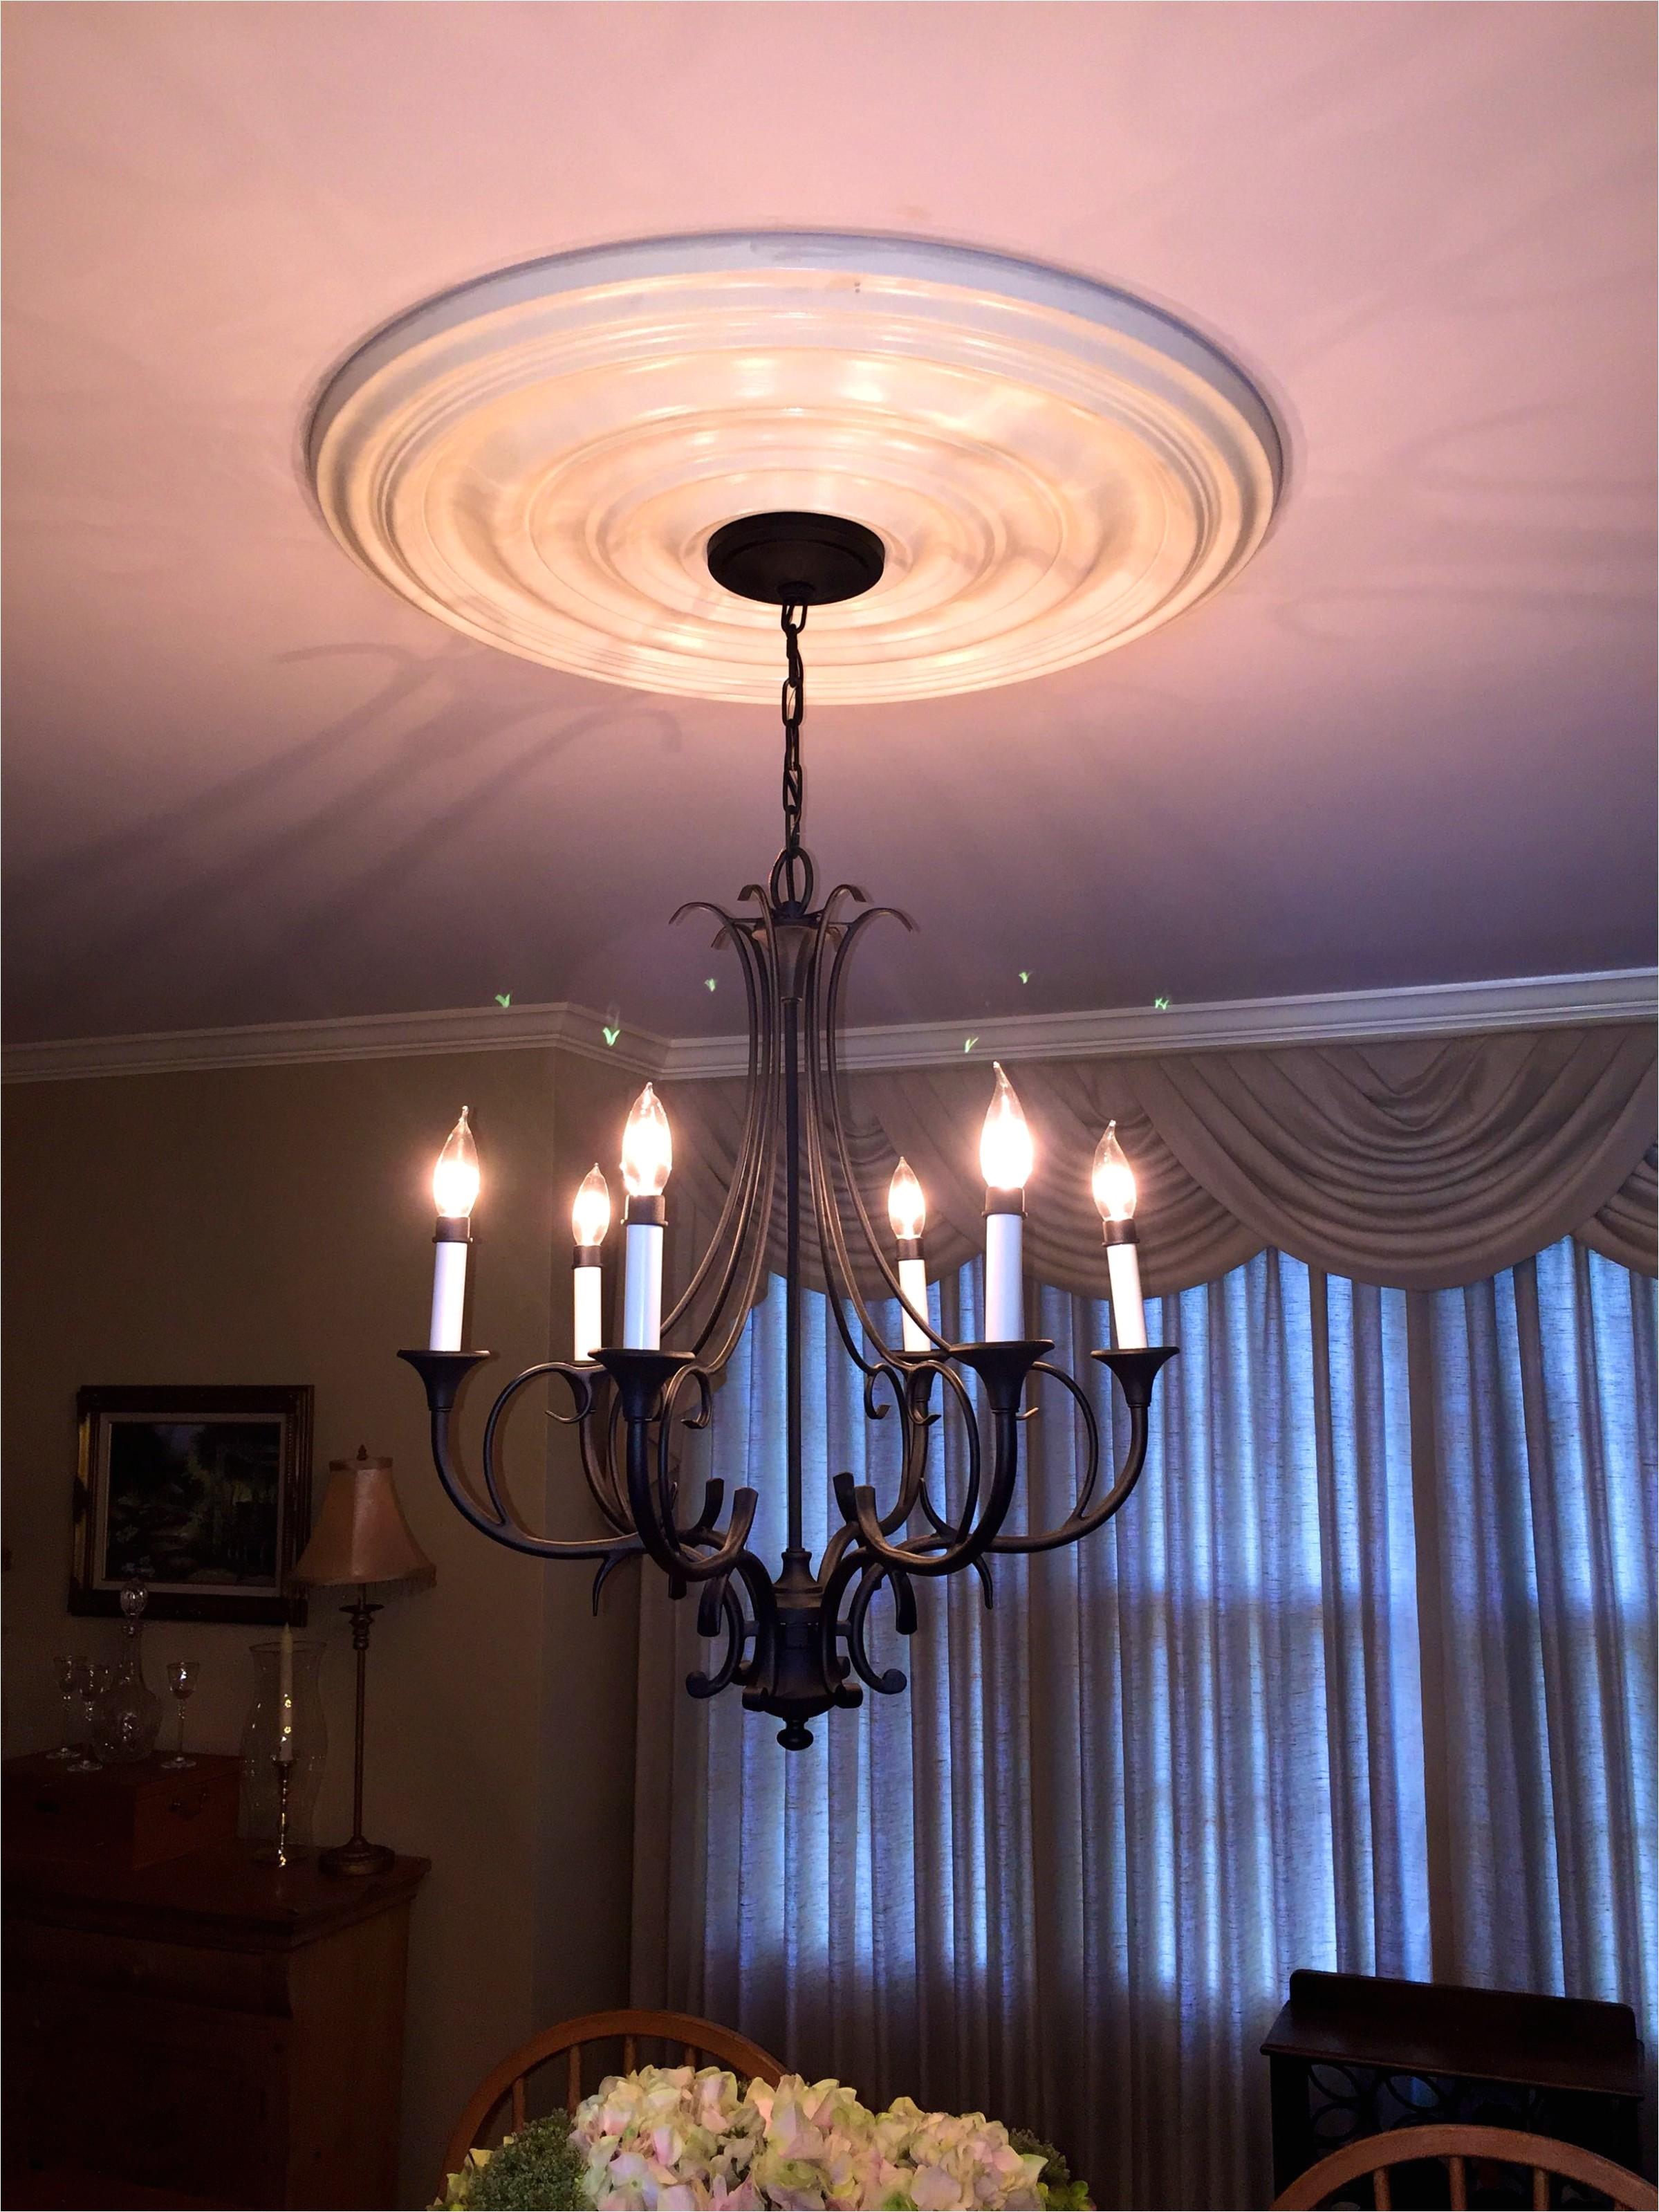 lighting fypon ltd cm16je2 inch od x id i contemporary ceiling aa· kitchen ceiling fan